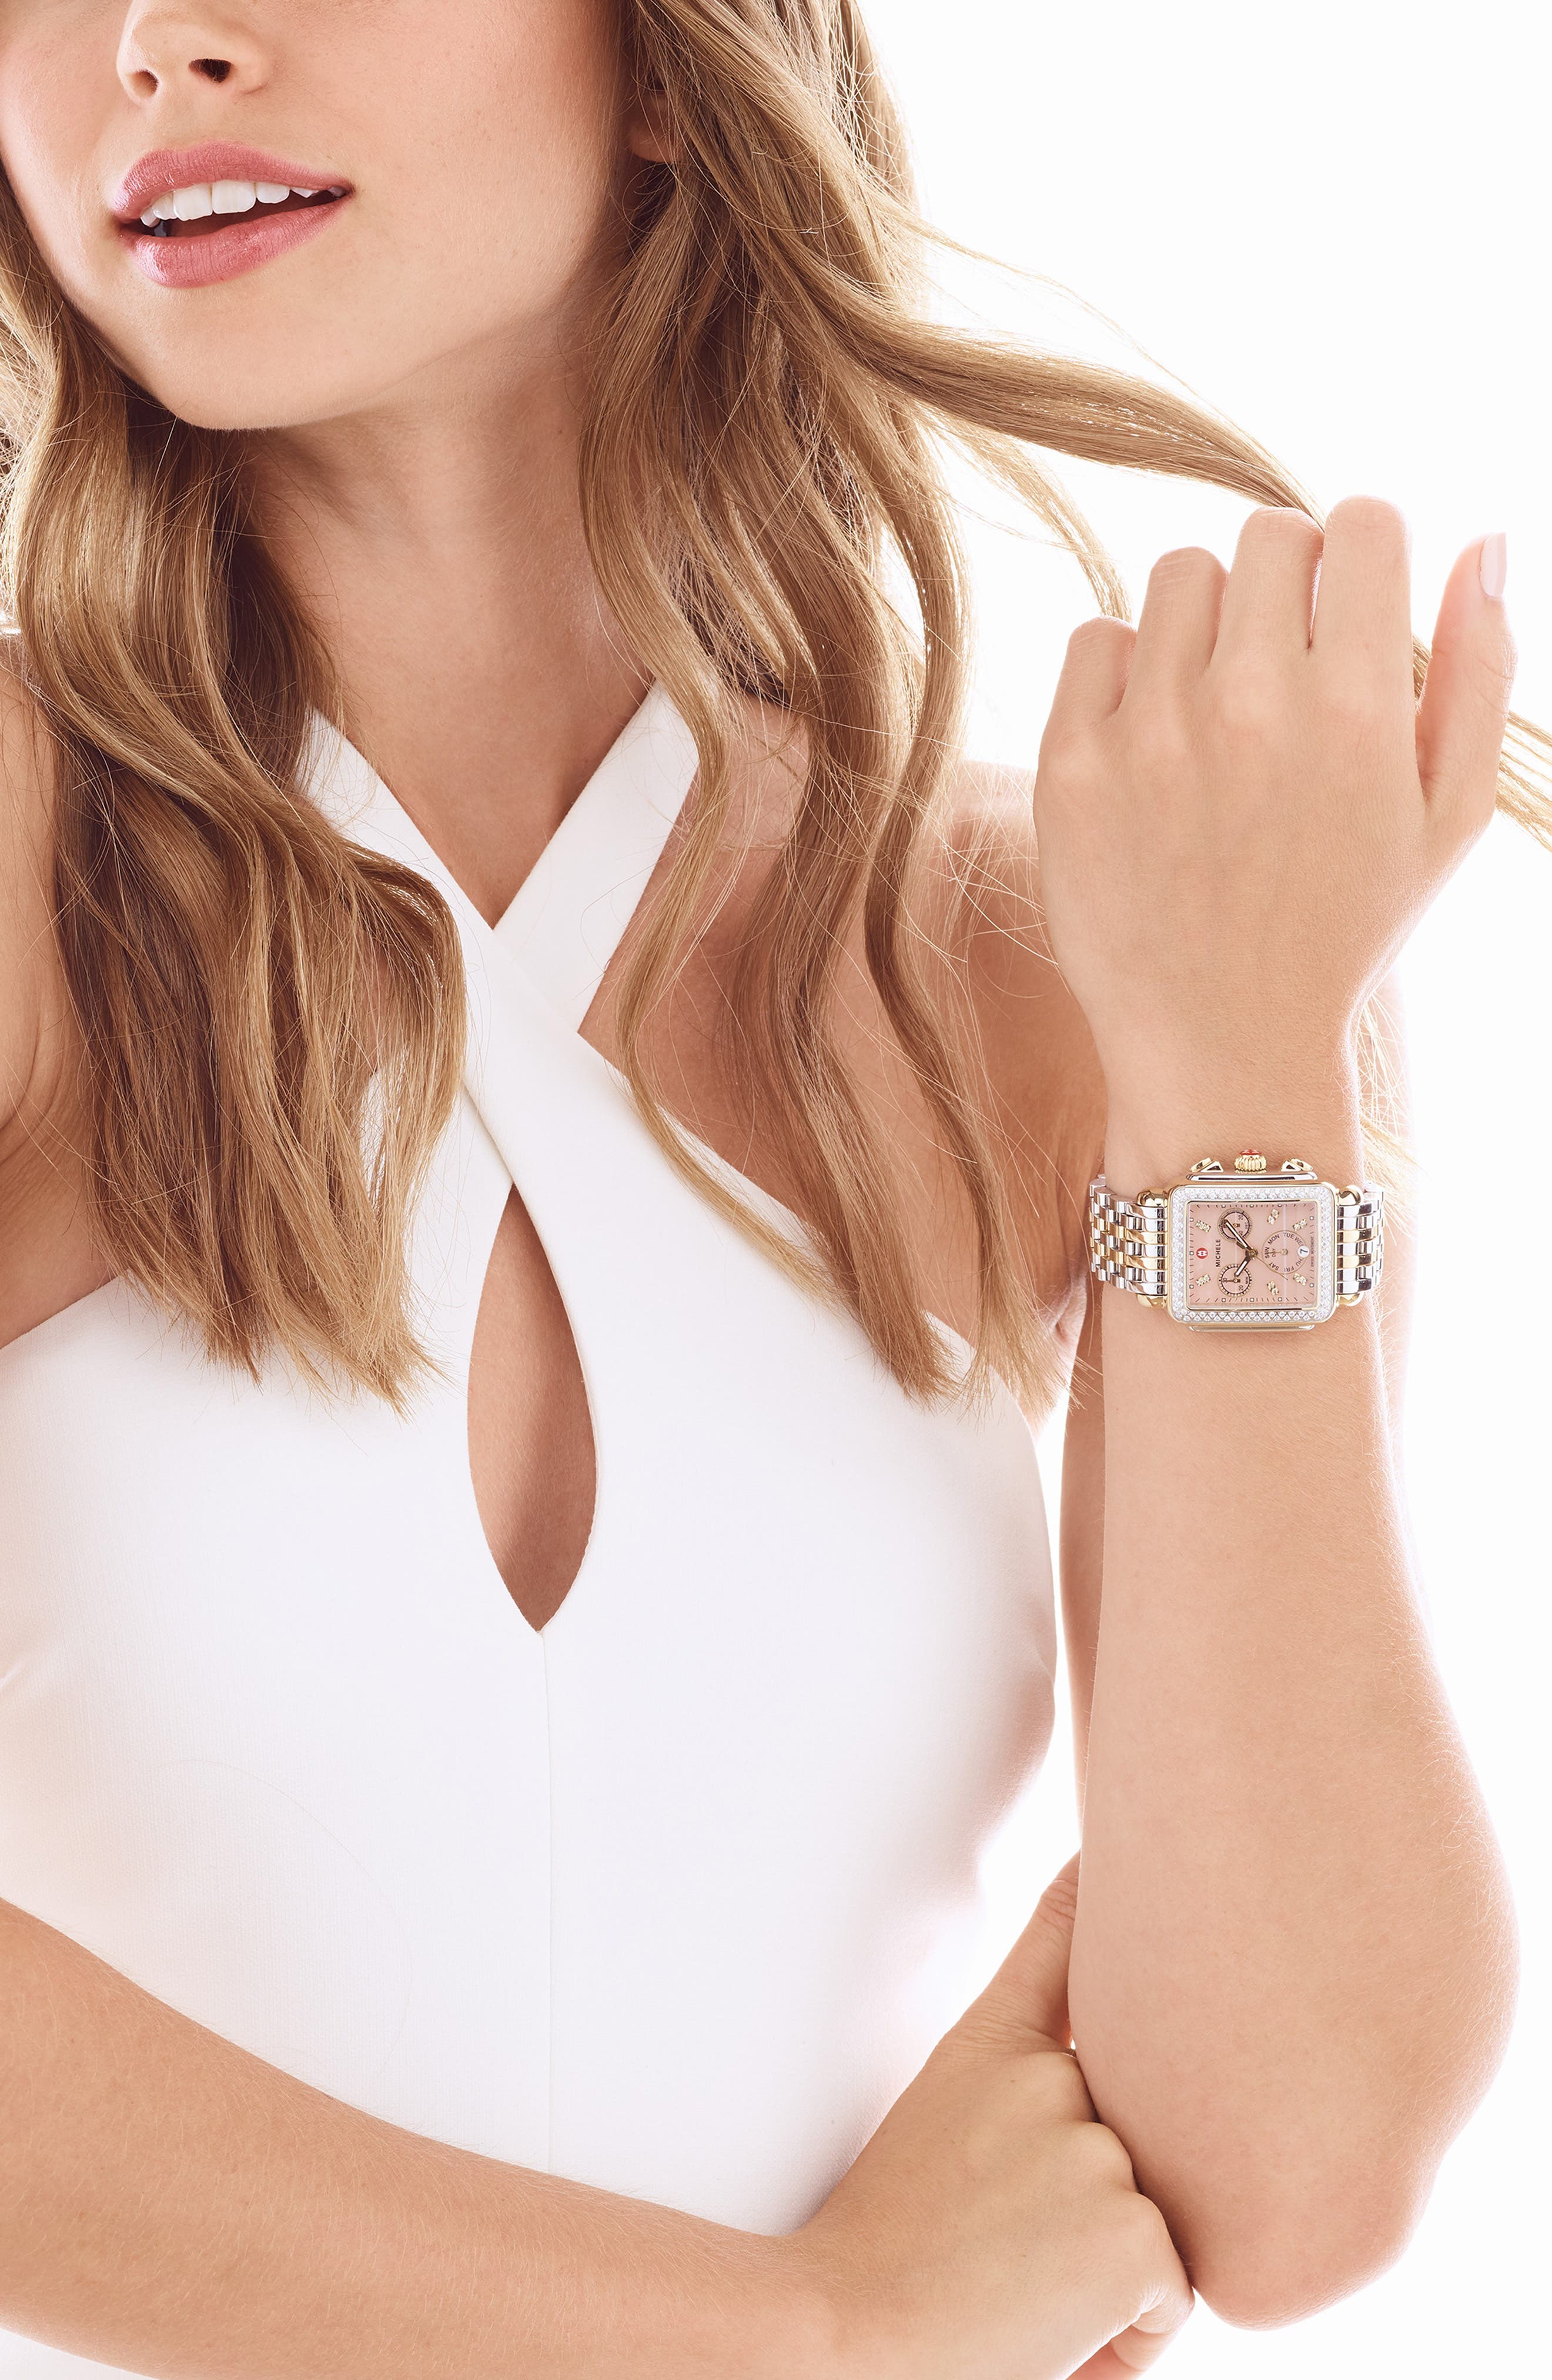 MICHELE, Deco Diamond Diamond Dial Watch Head, 33mm x 35mm, Alternate thumbnail 2, color, GOLD/ SILVER/ DESERT ROSE MOP